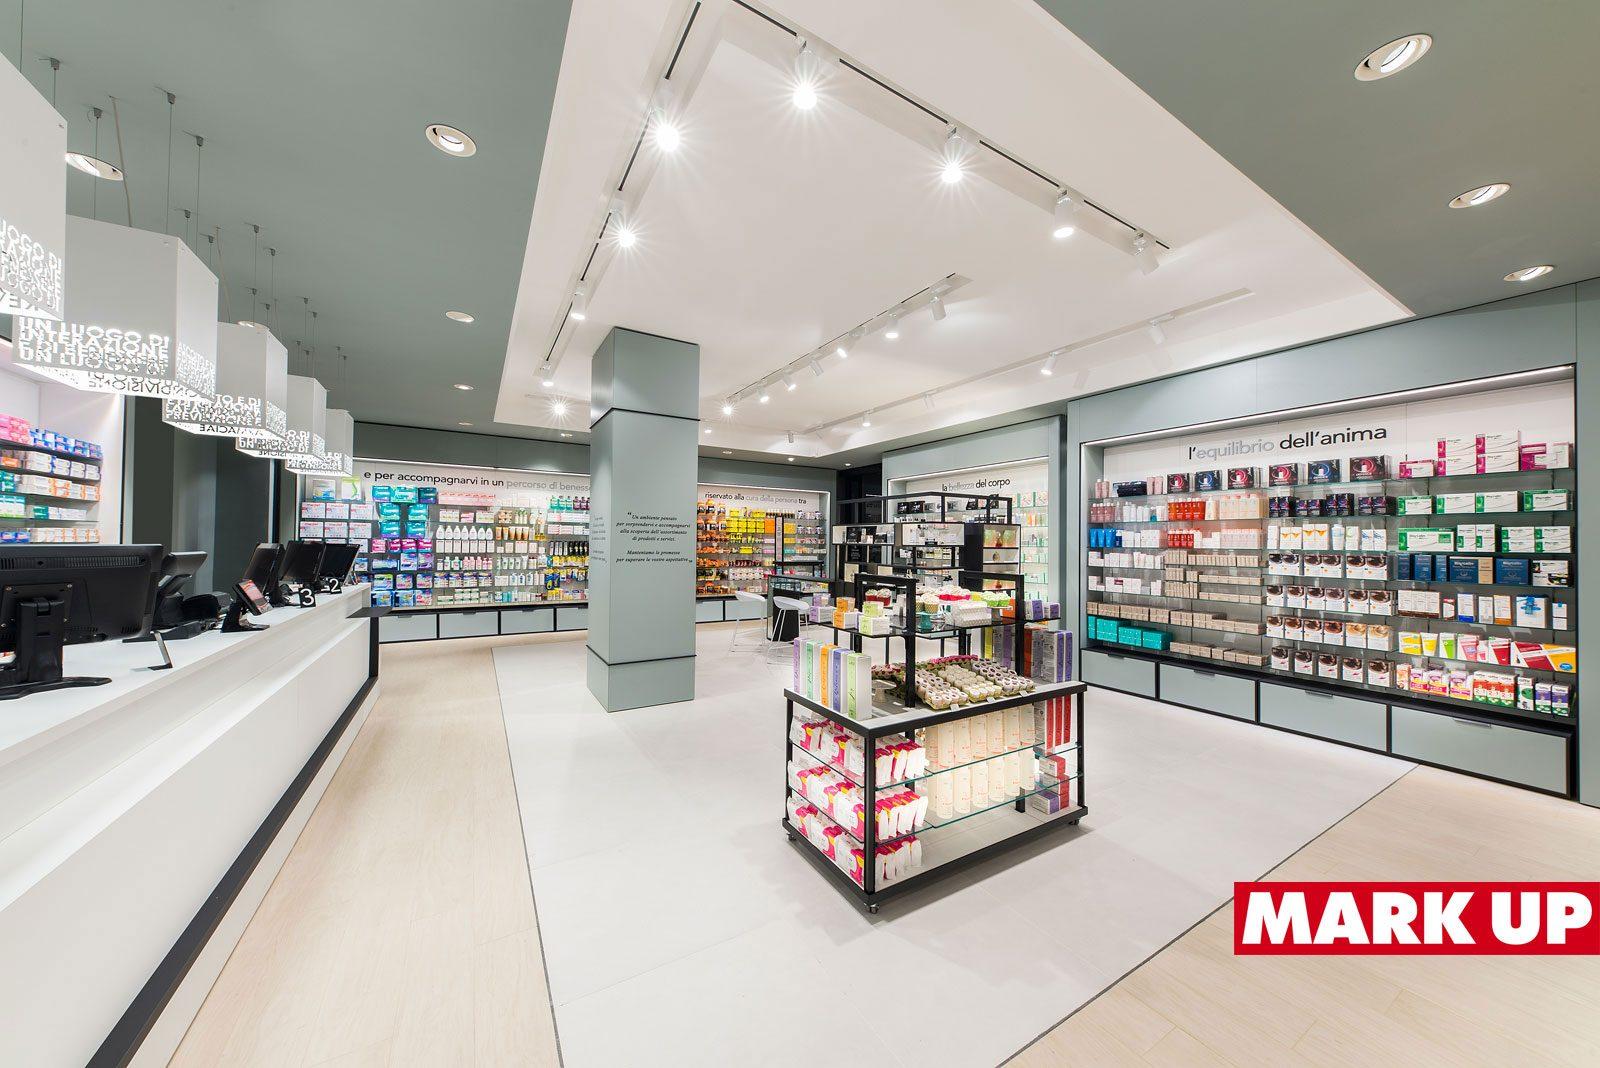 Farmacia Fares on Mark Up | Pharmalab